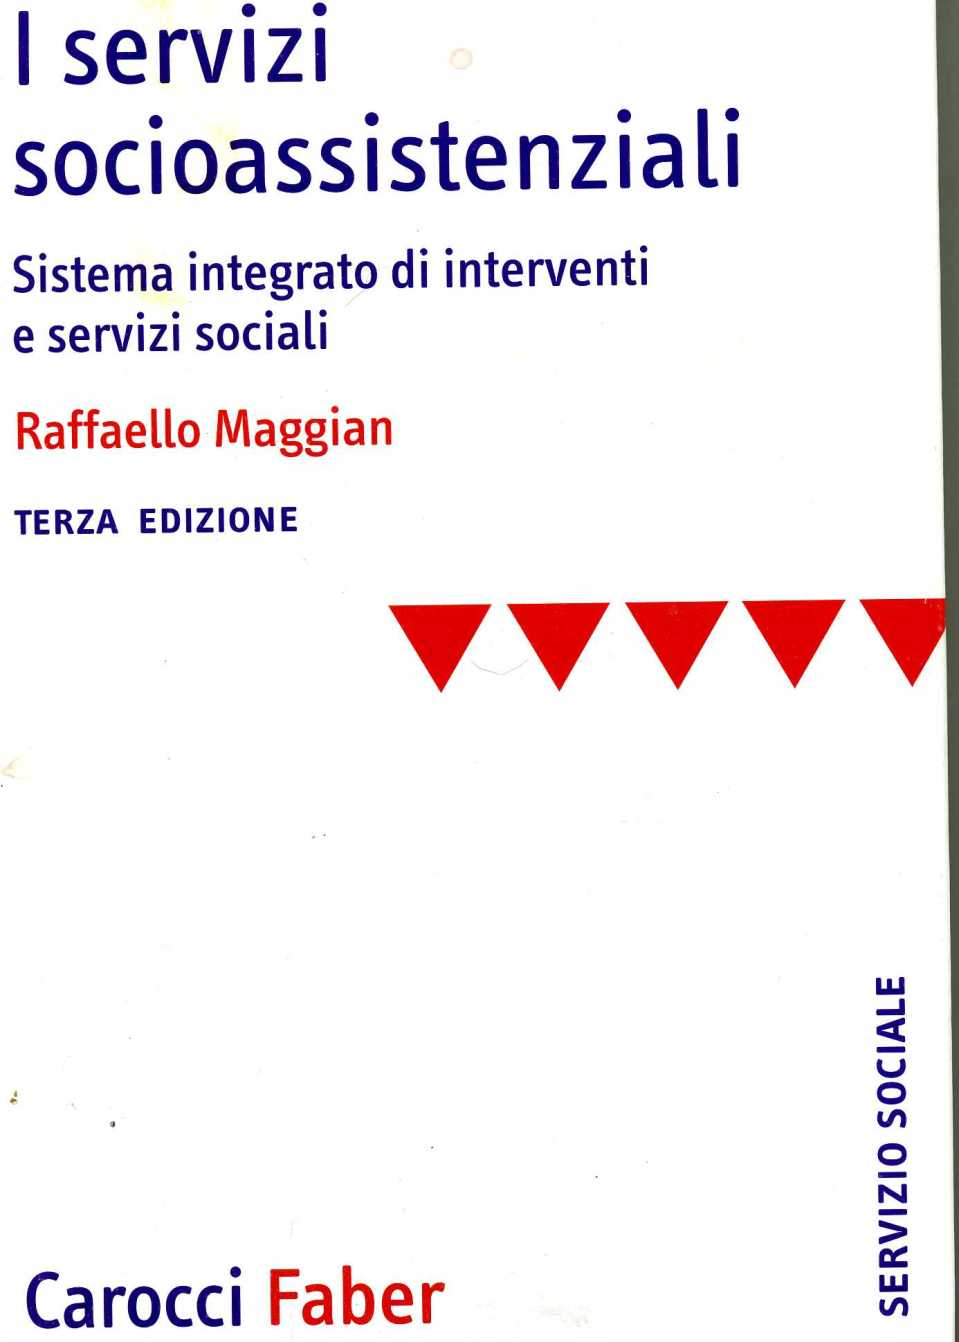 maggian568